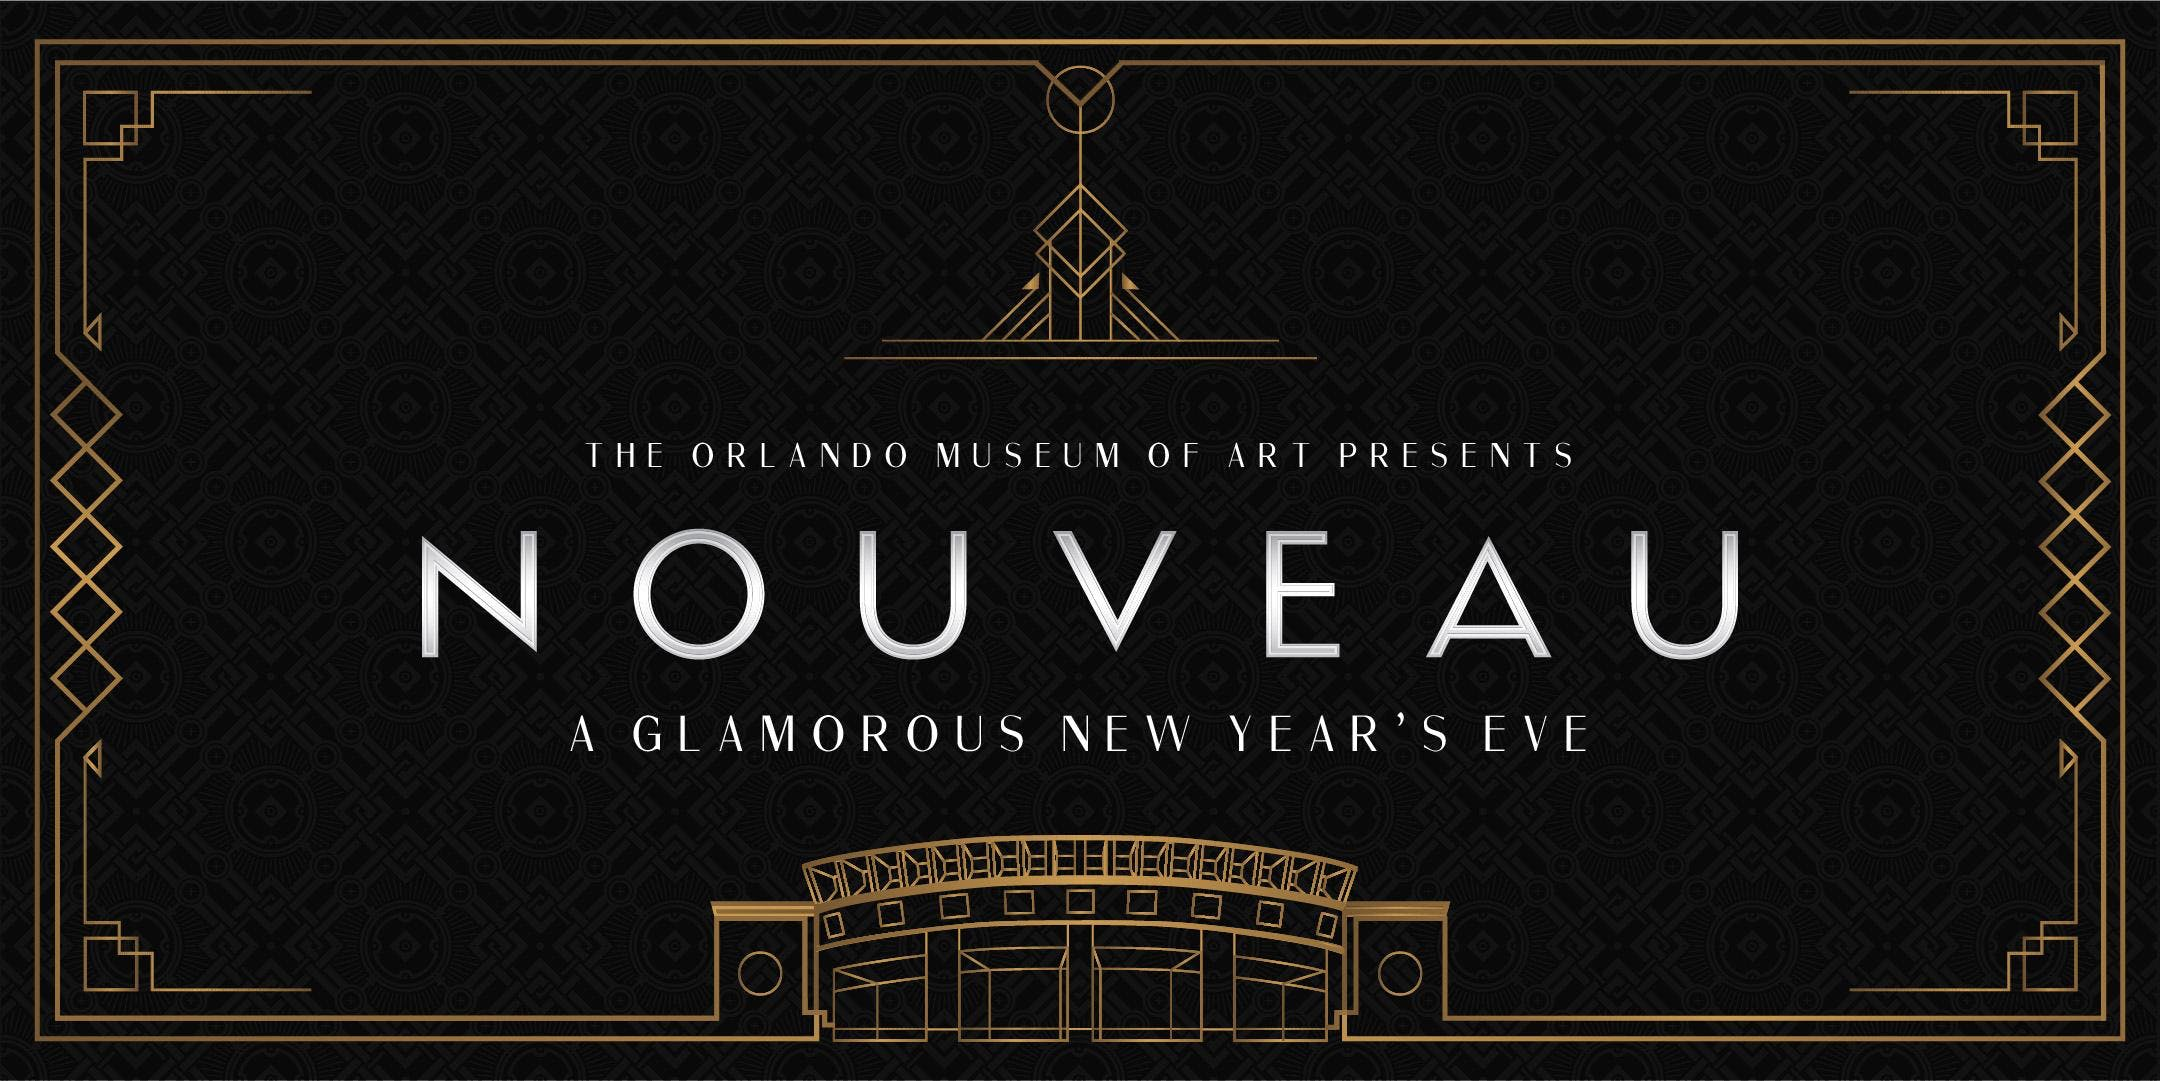 NOUVEAU: A Glamorous New Year's Eve, Bradenton & Sarasota FL - Dec 31, 2018 - 9:30 PM